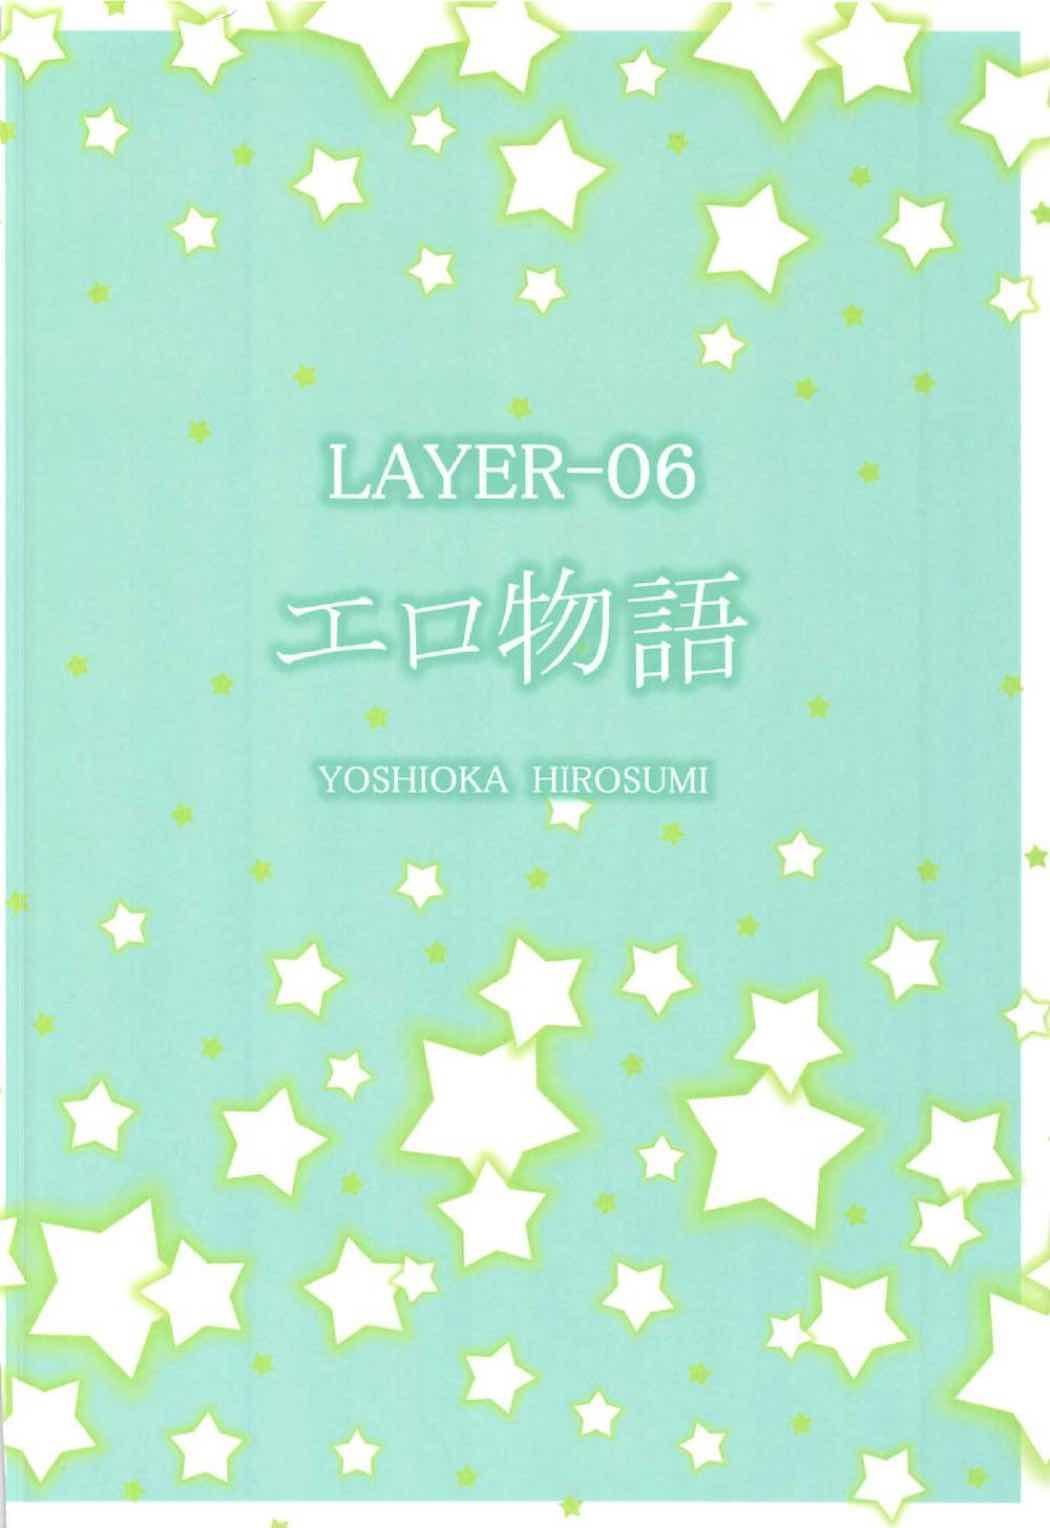 LAYER-06 Eromonogatari 25